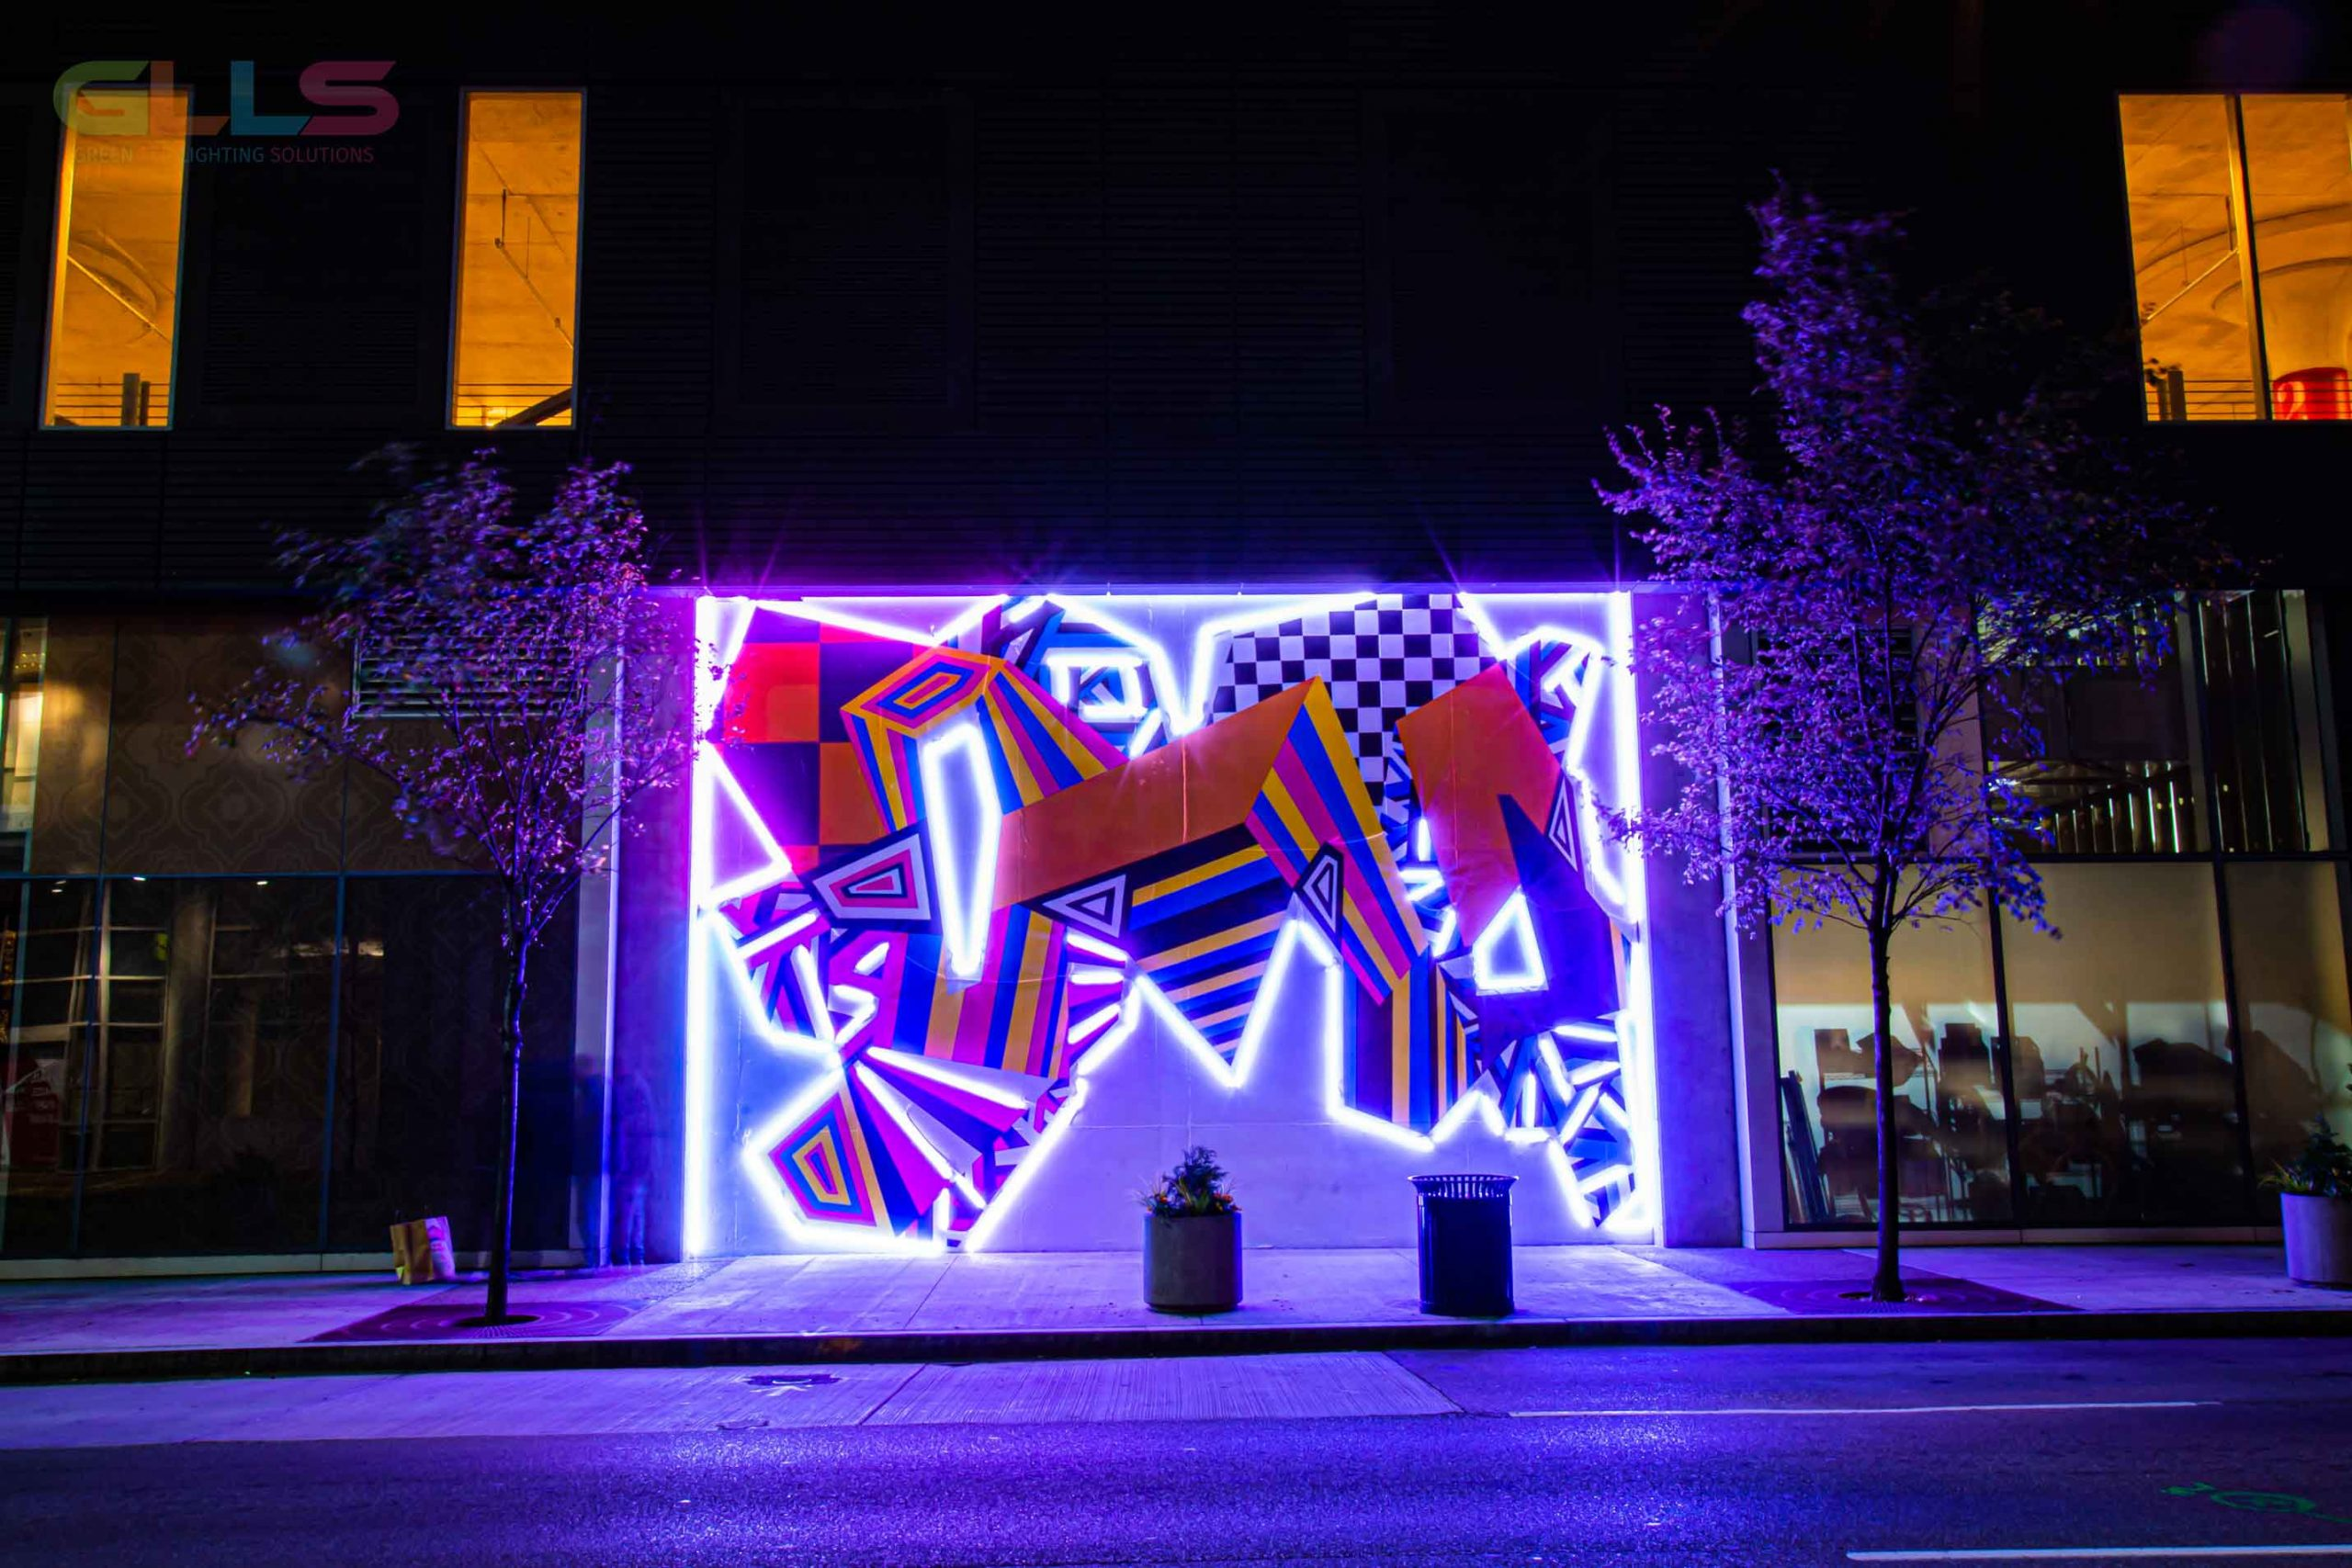 Chase-Melendez-Wall-Mural-Art---Cincinnati6